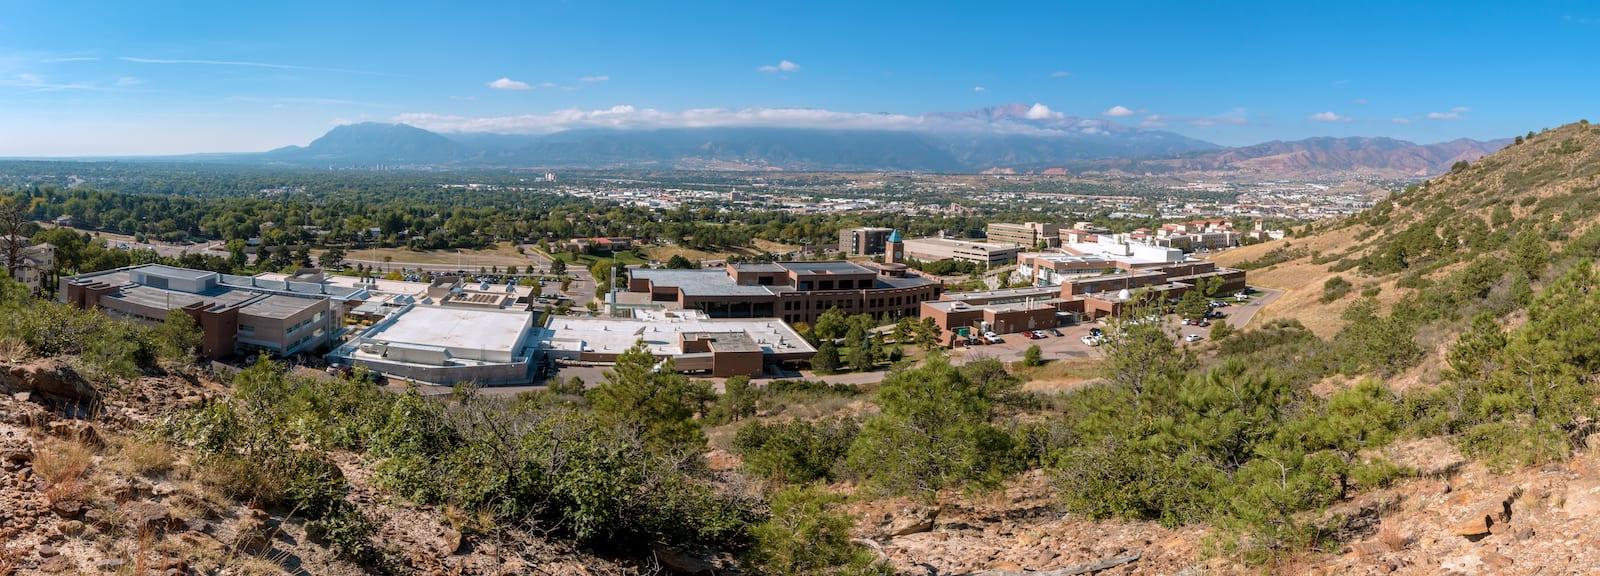 Colorado Front Range Pikes Peak UCCS Campus